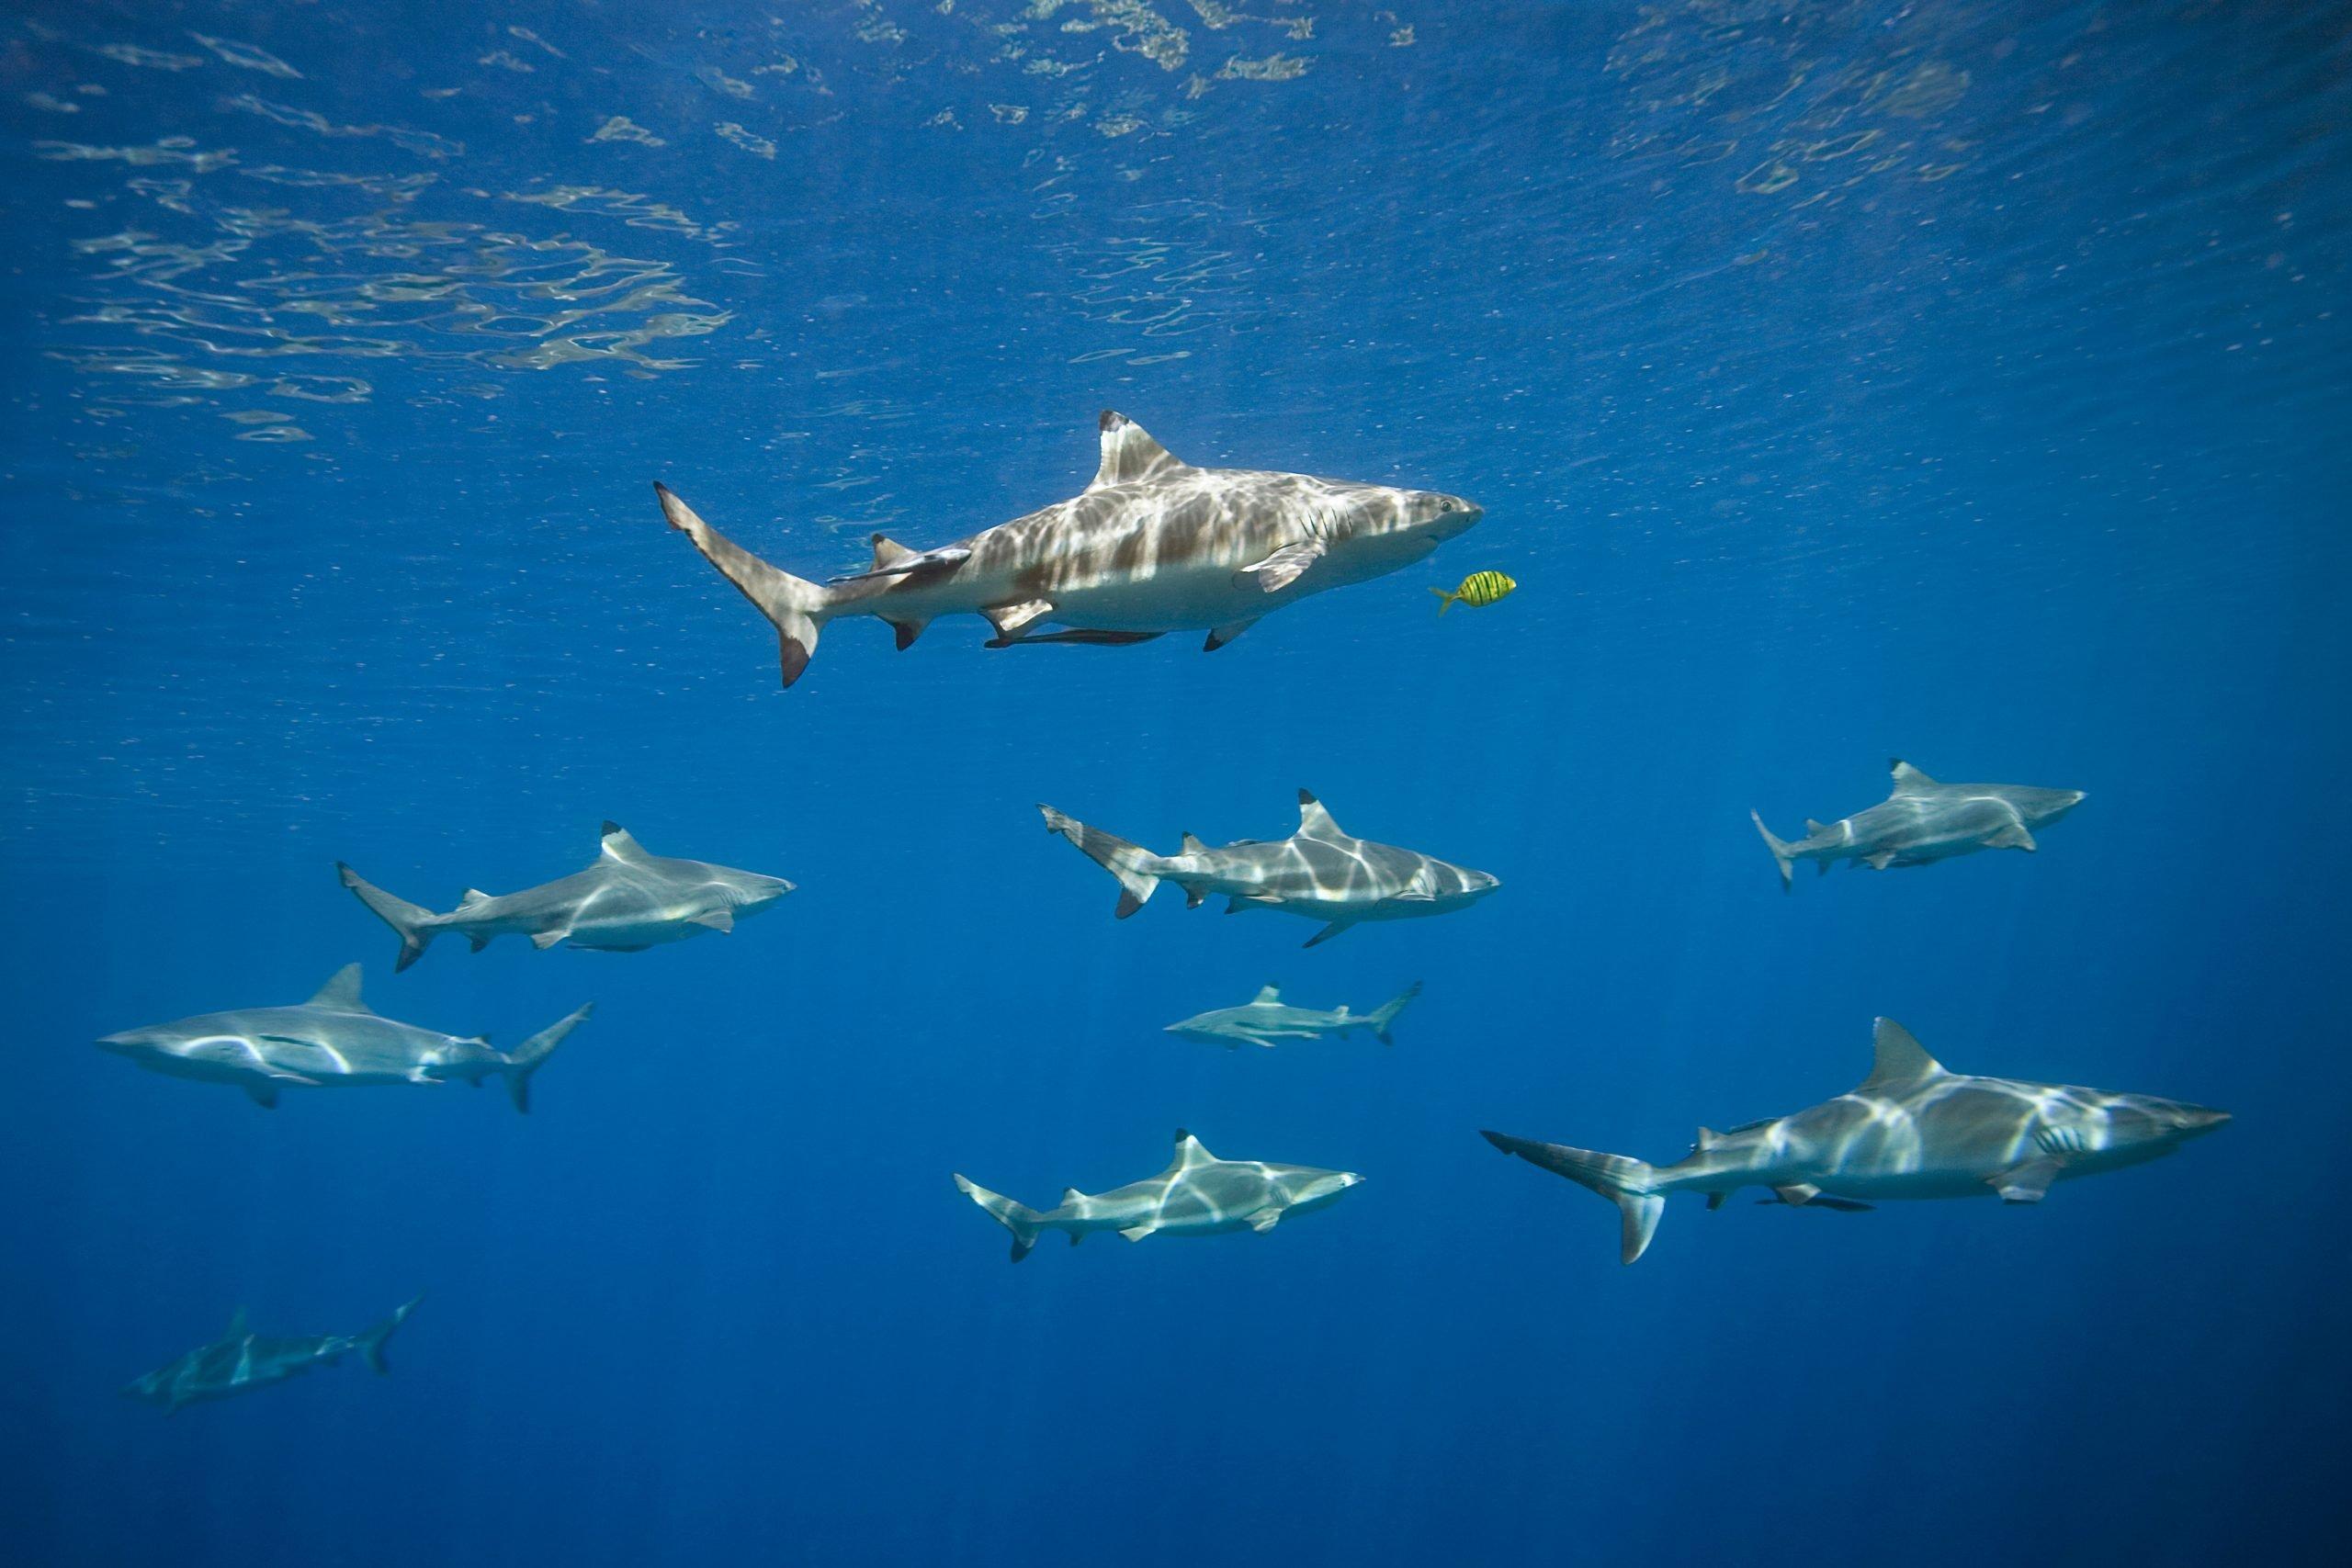 blacktip sharks swimming in a school